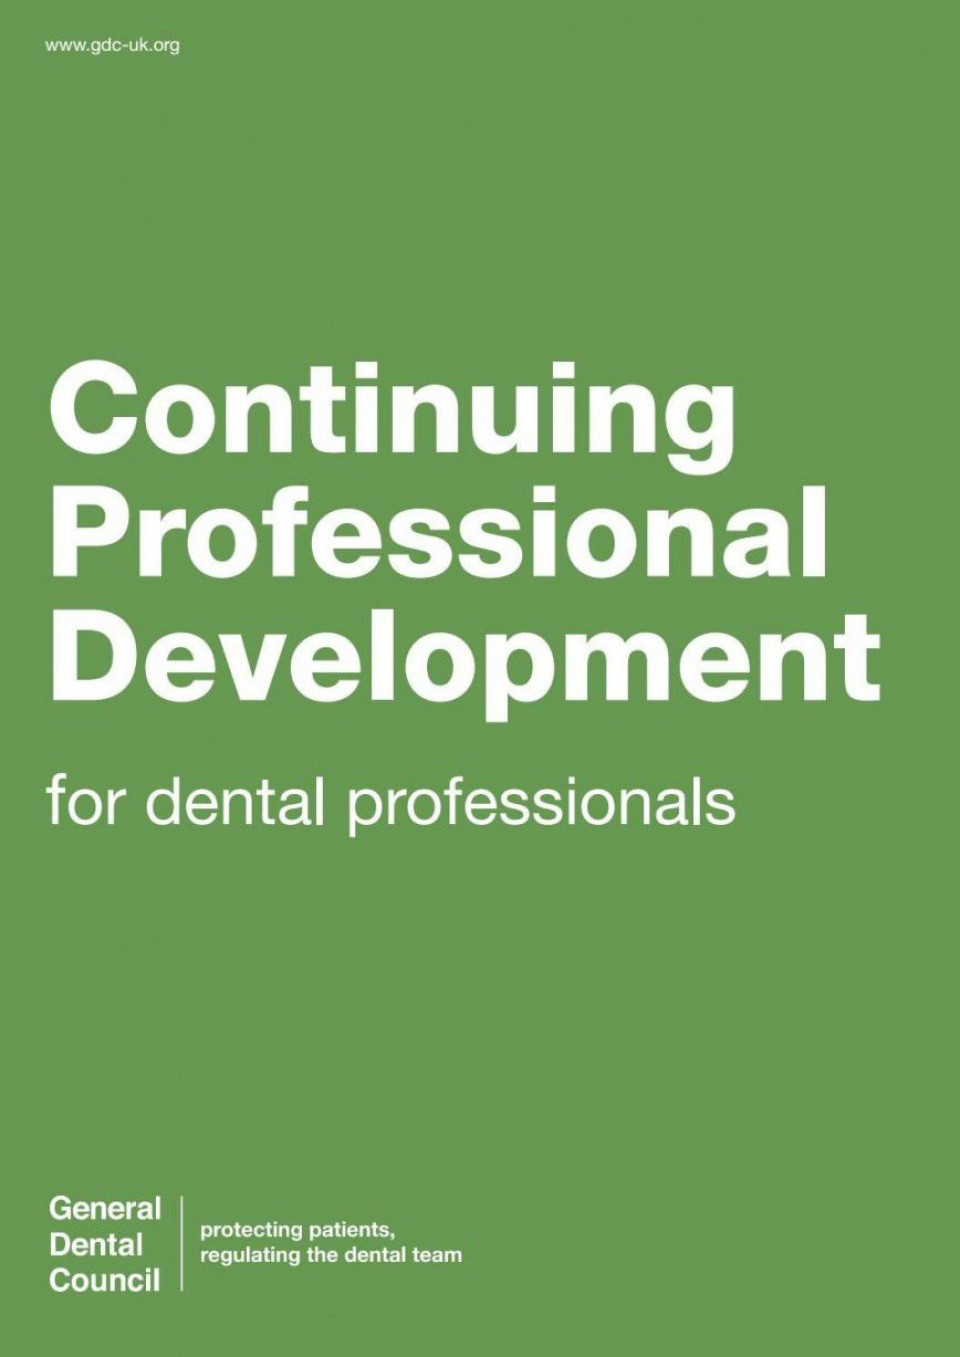 000 Breathtaking Personal Development Plan Template Gdc Inspiration  Free960